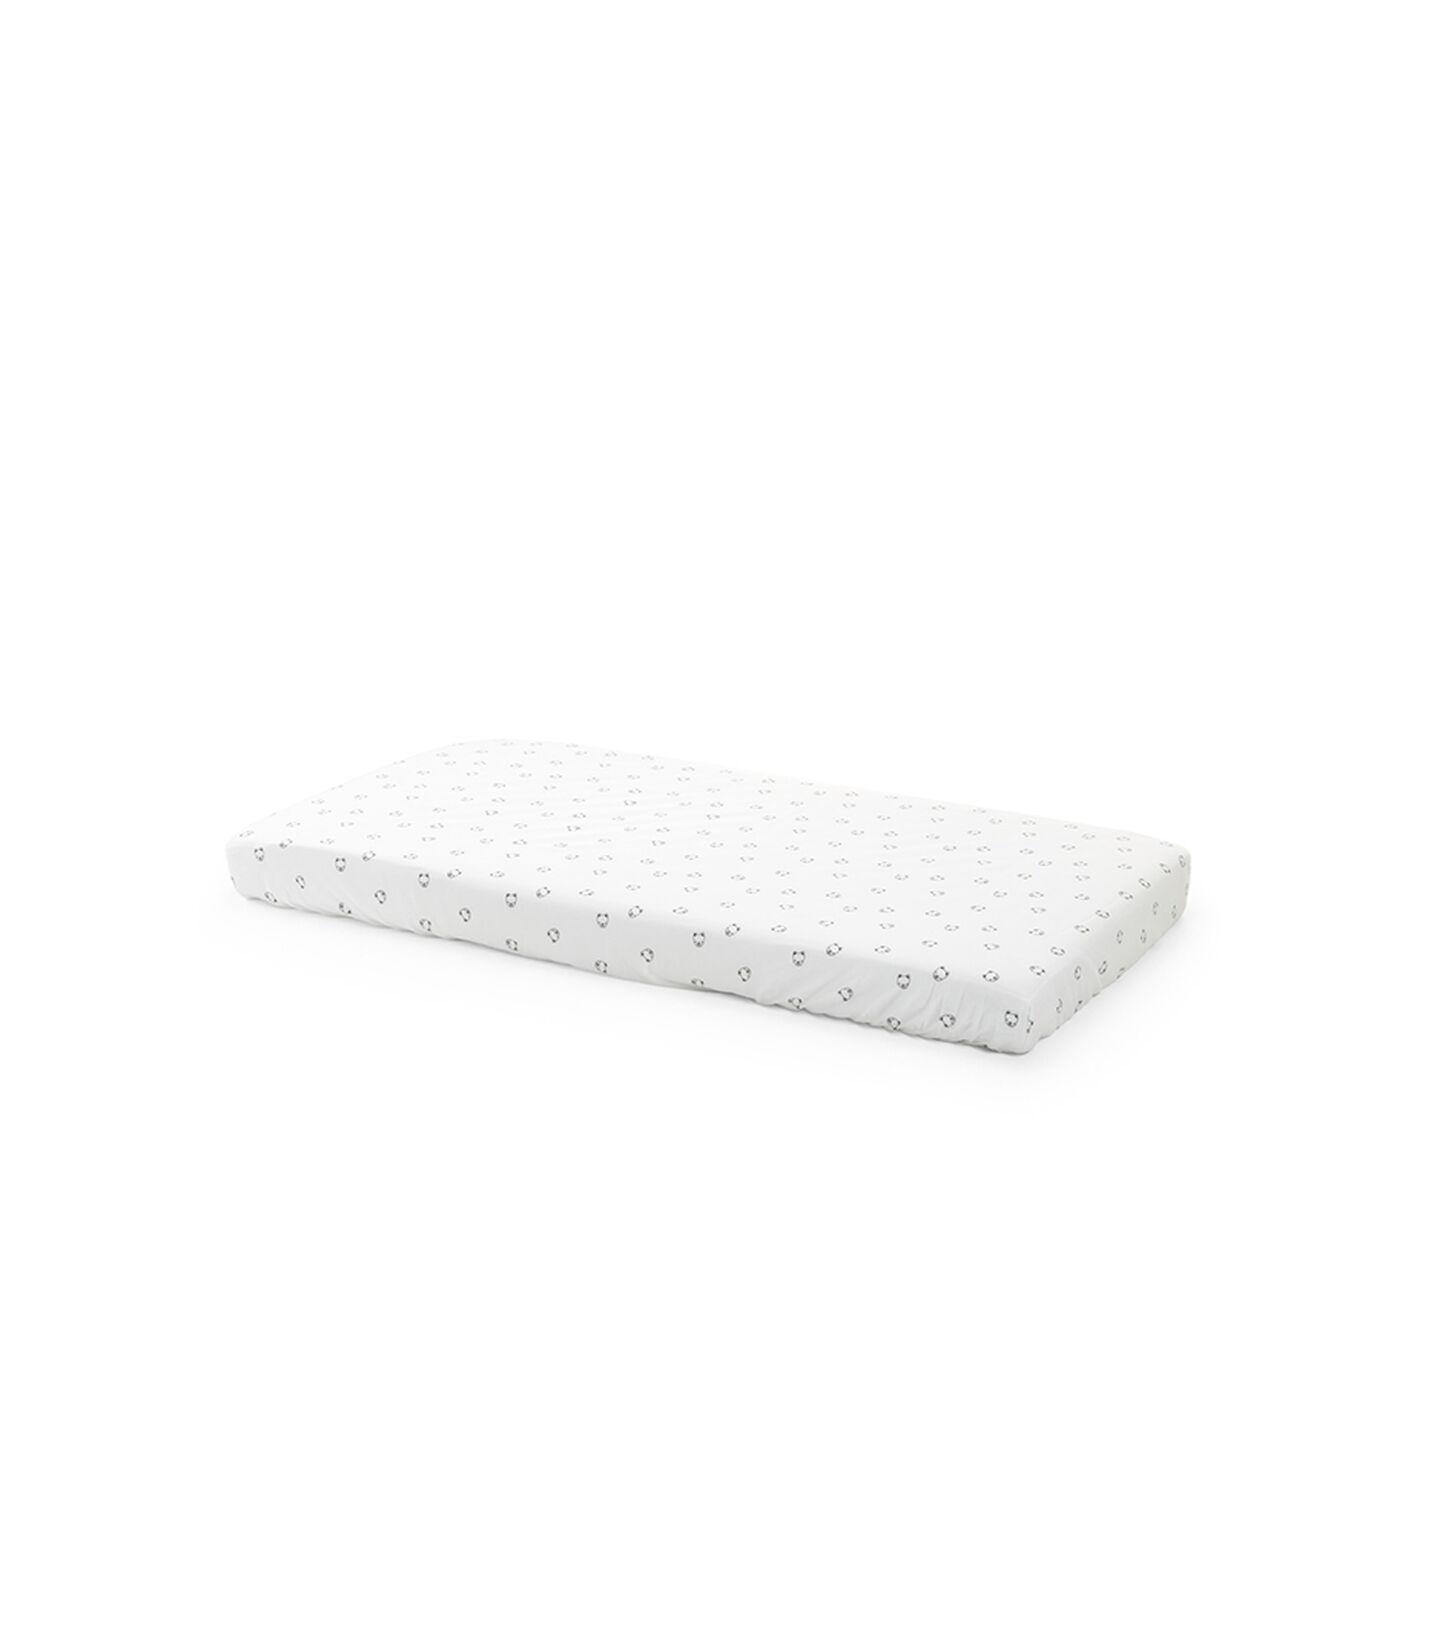 Stokke® Home™ Bed hoeslaken 2st - Monochrome Bear, Monochrome Bear, mainview view 2